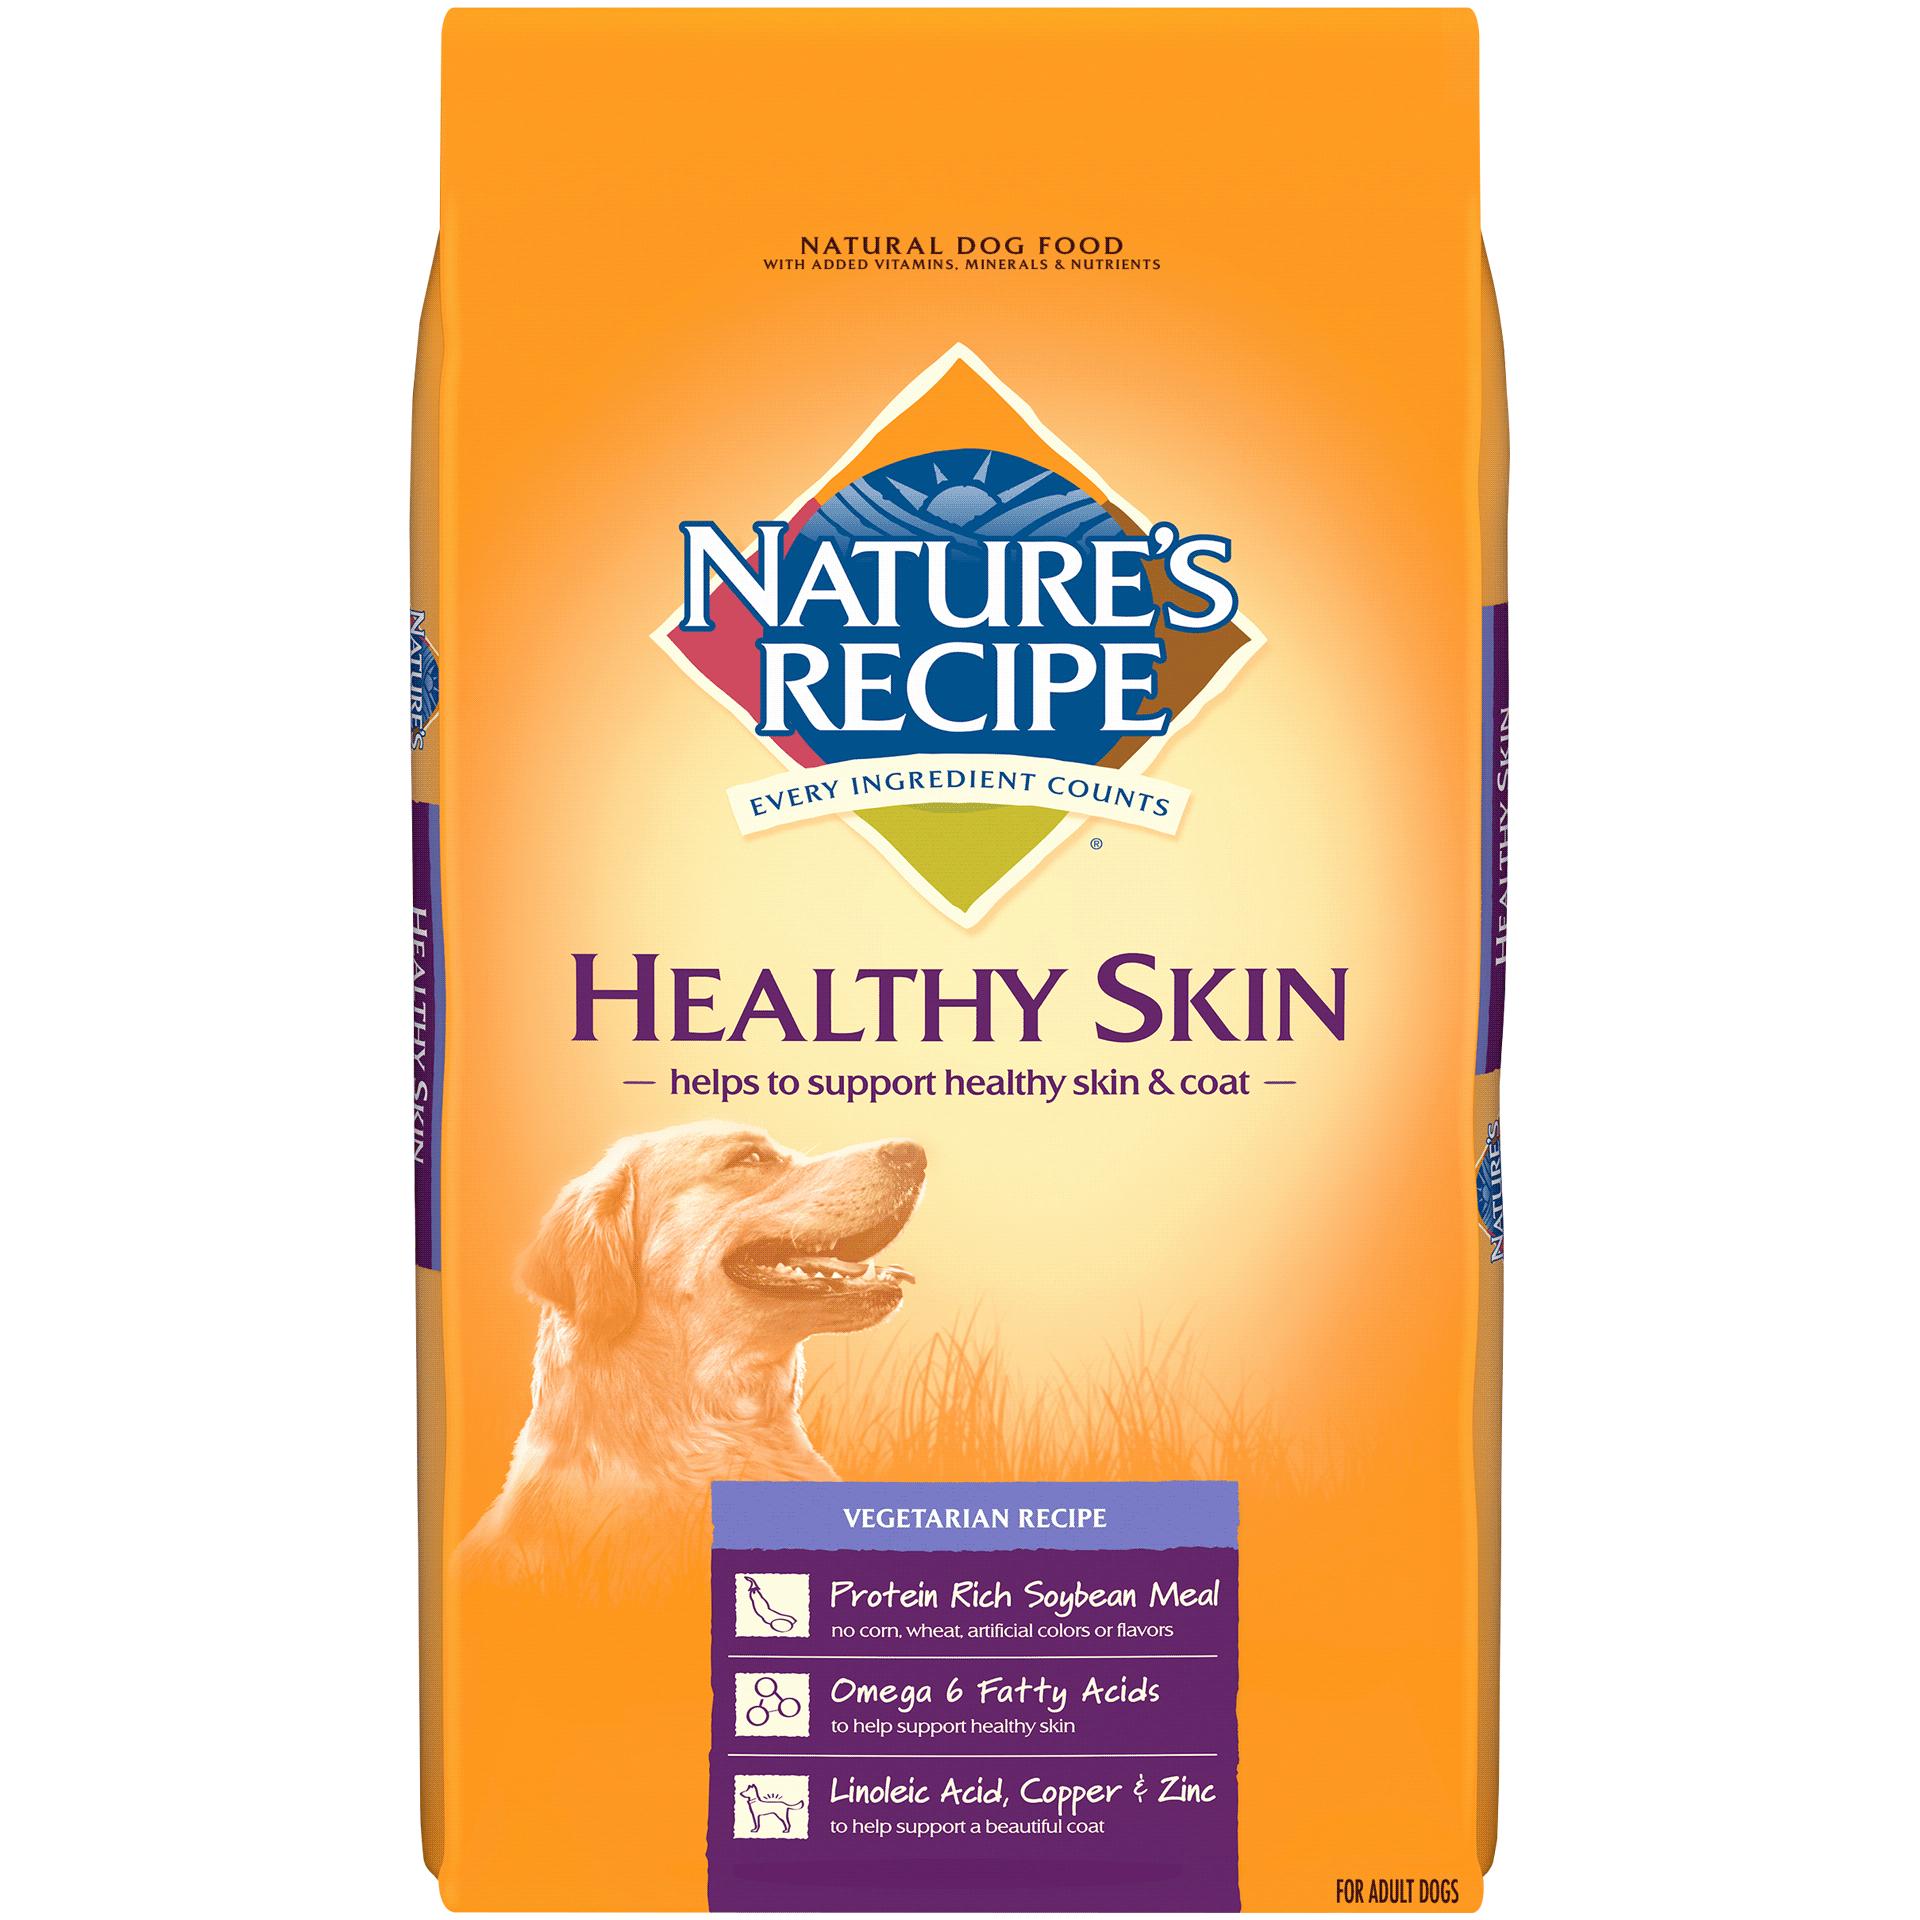 Healthy Skin Vegetarian Recipe